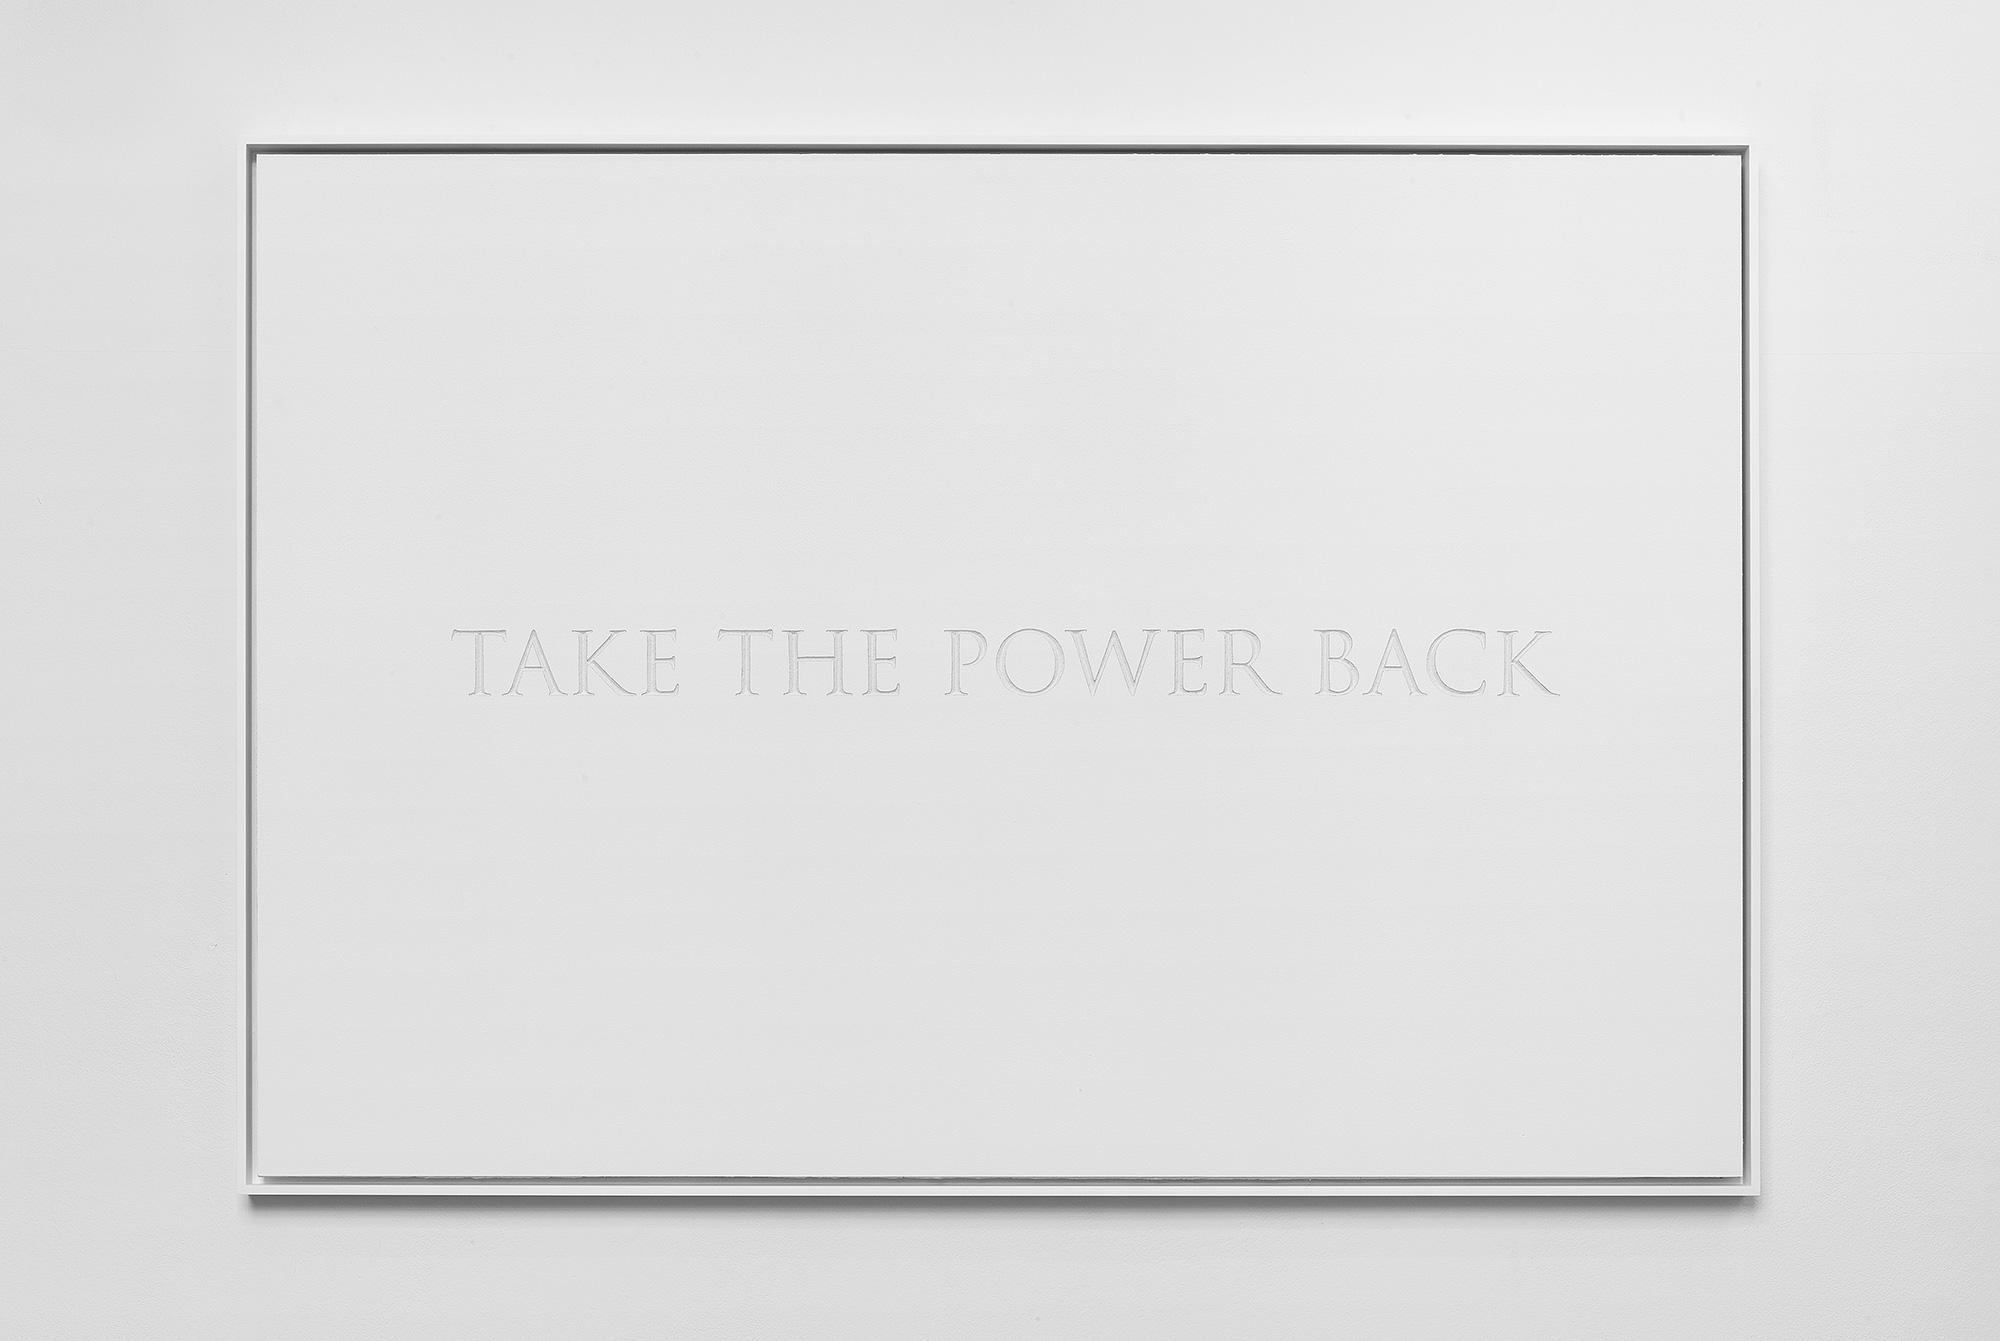 Famed, Take the Power Back